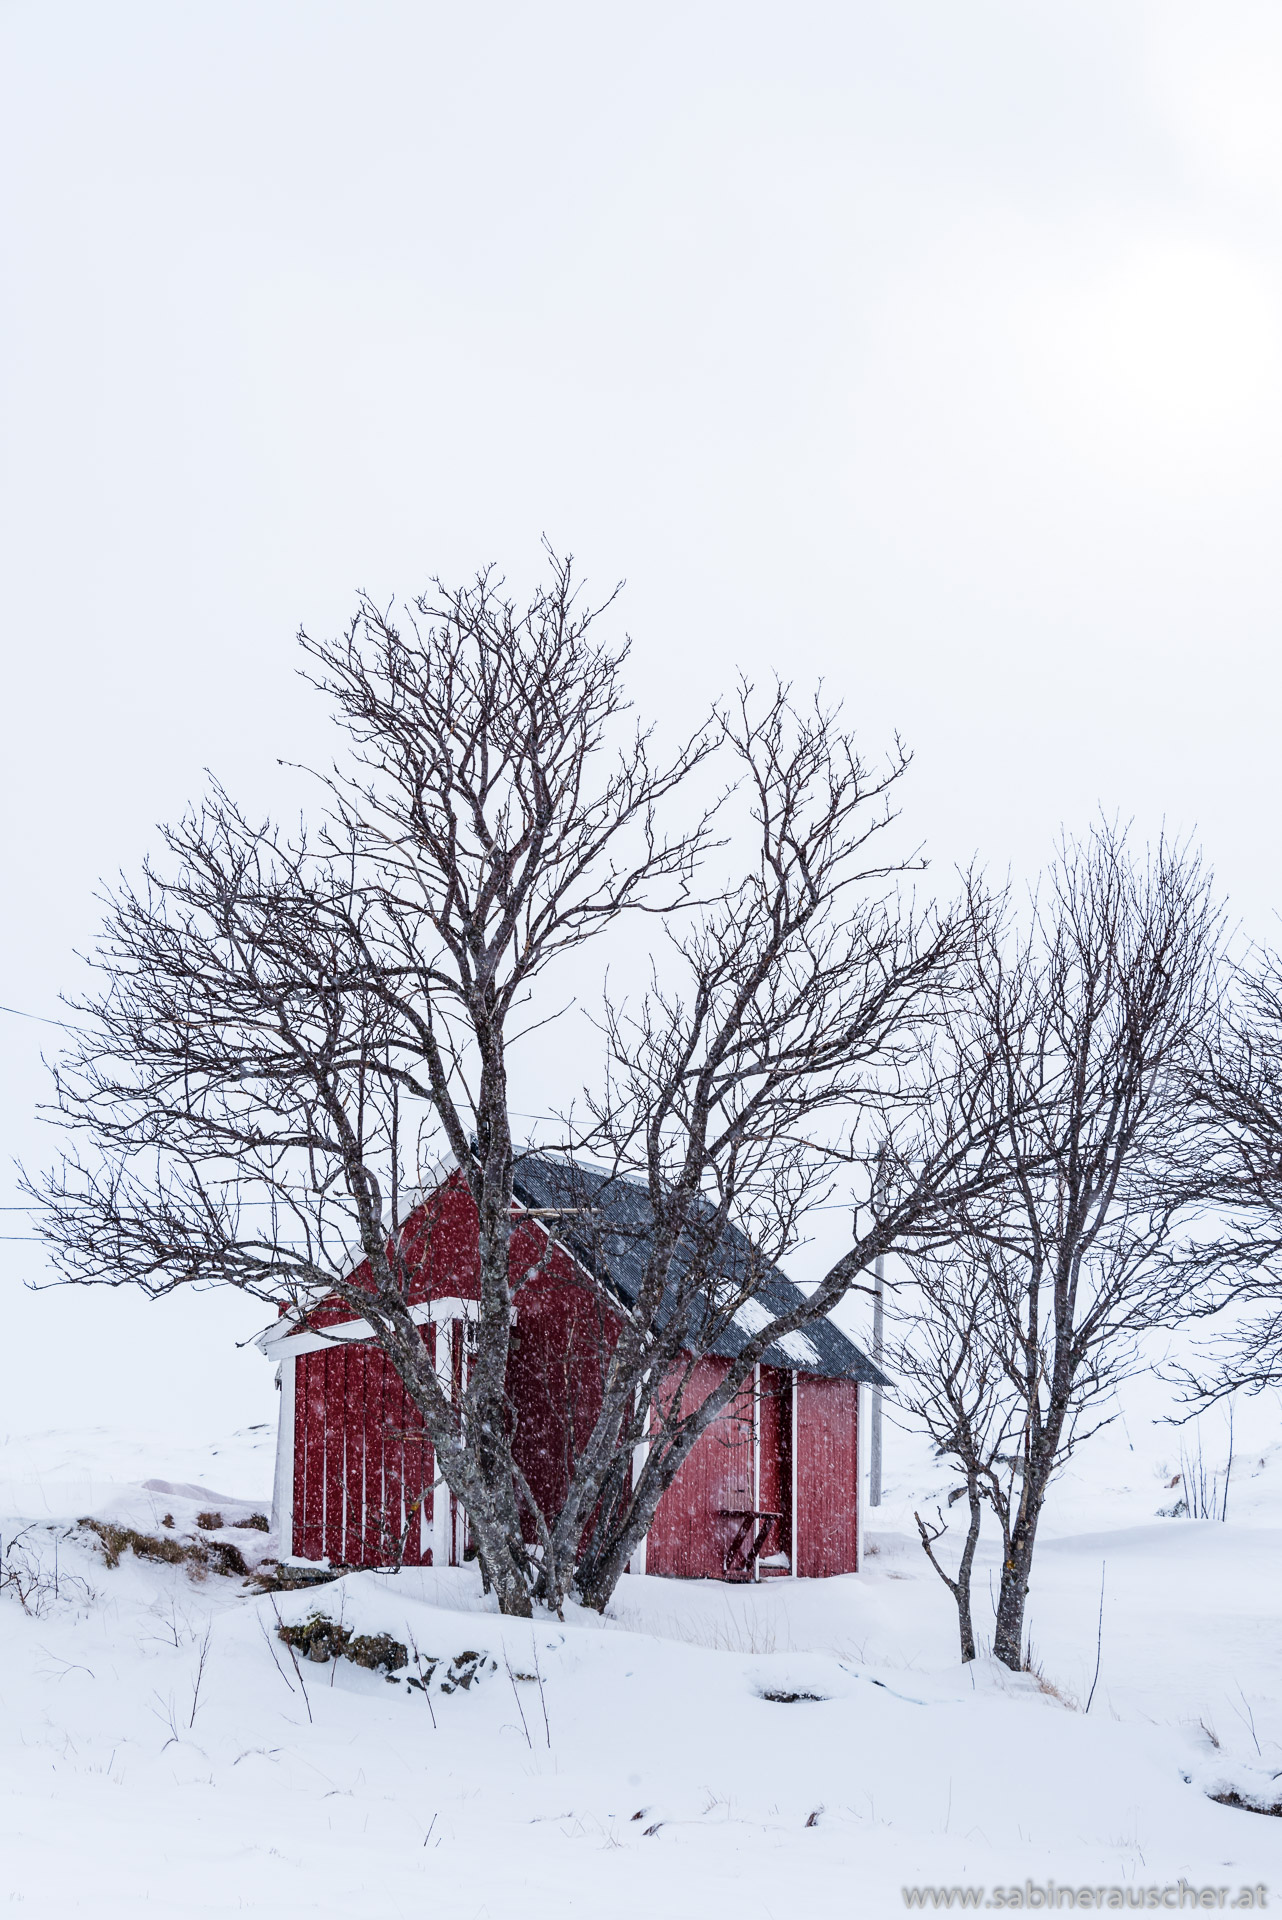 snowfall in Borgvag | Schneegestöber in Borgvag